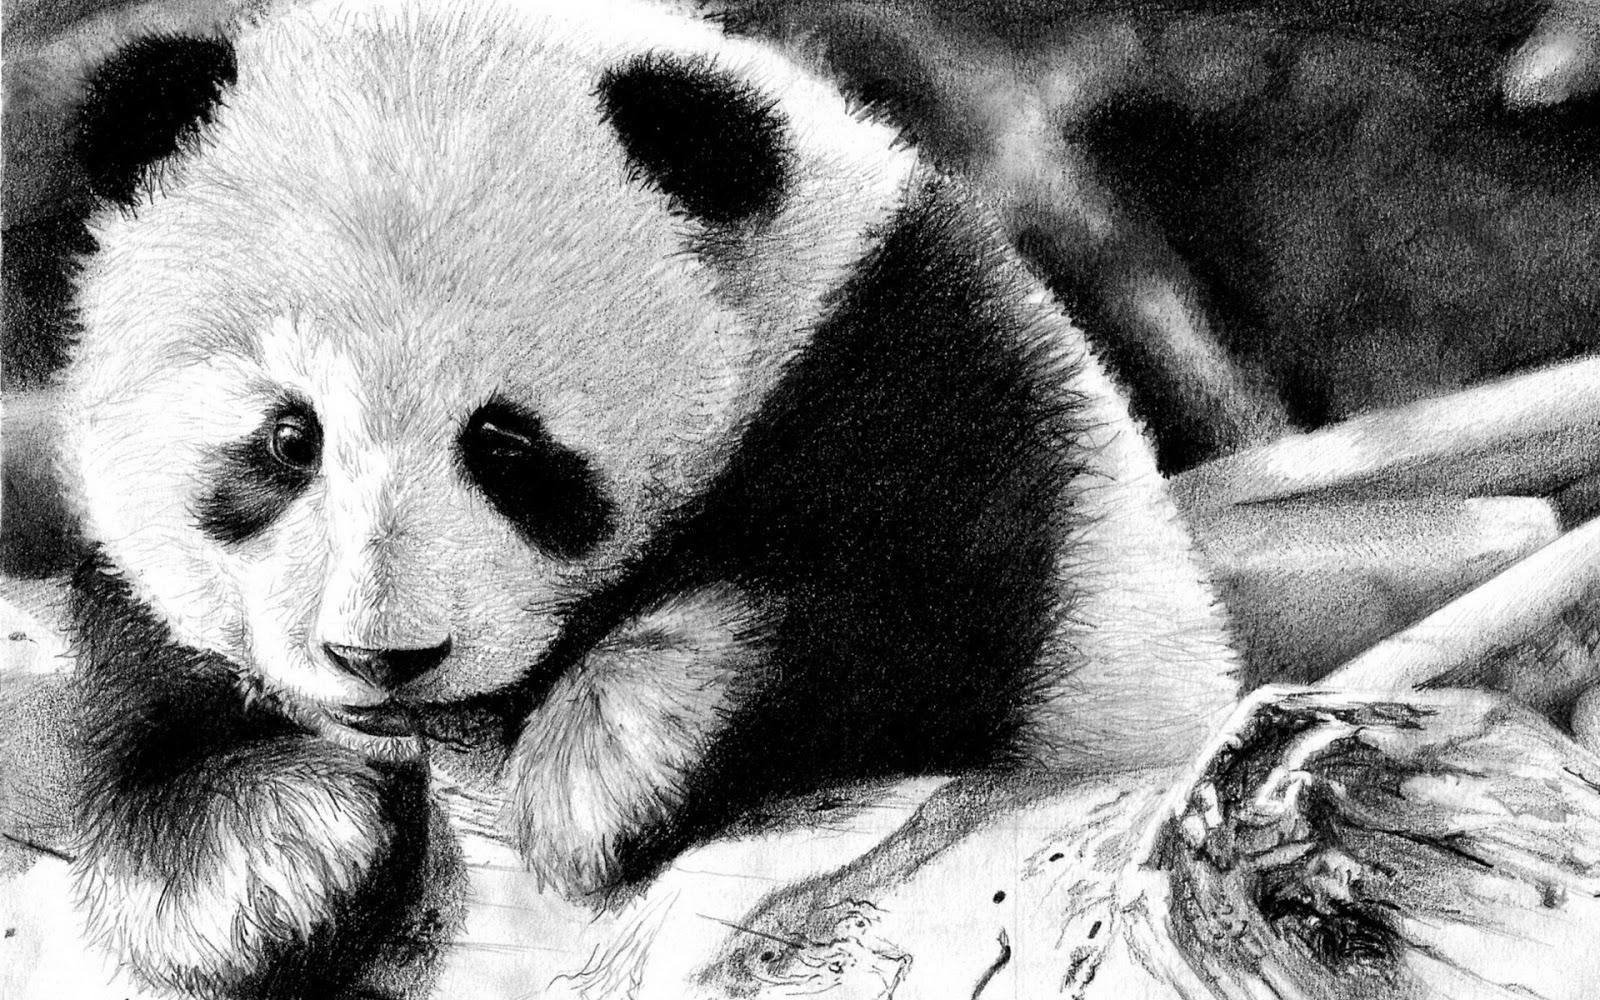 Sleeping Panda Wallpaper sleeping panda live wallpaper sleeping